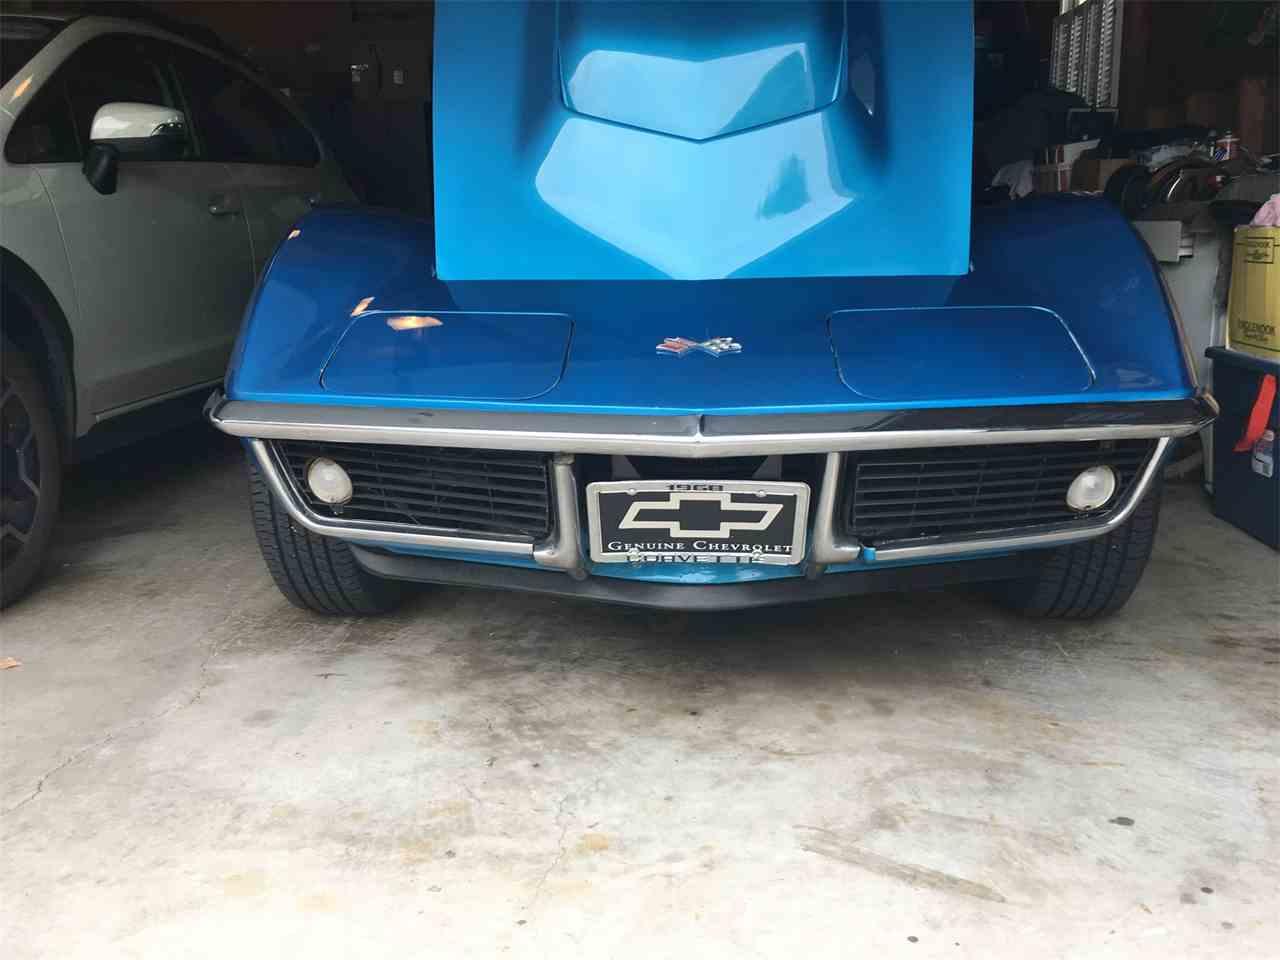 Large Picture of Classic 1968 Chevrolet Corvette located in Pennsylvania - $28,900.00 - LUSX